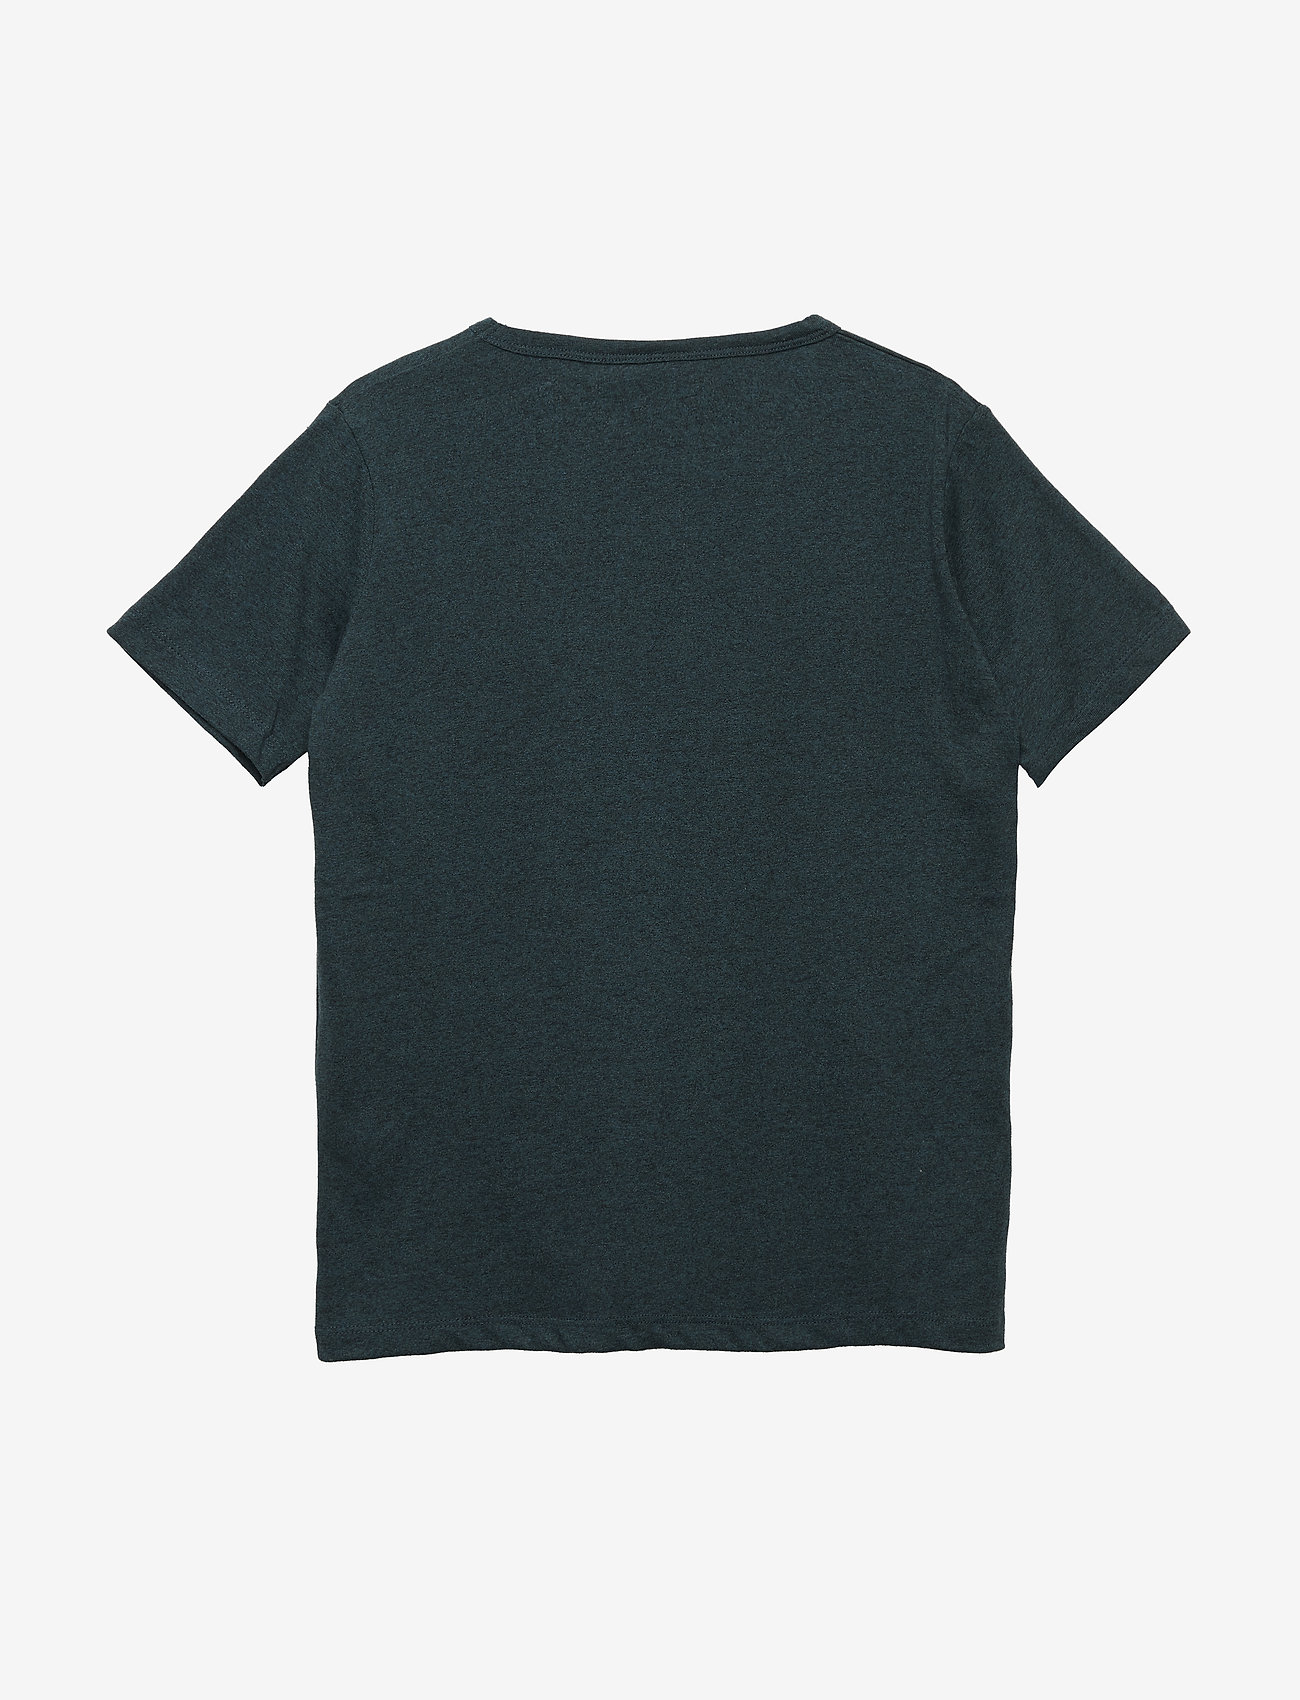 Petit by Sofie Schnoor - T-shirt short sleeve - kortærmede - dark green - 1